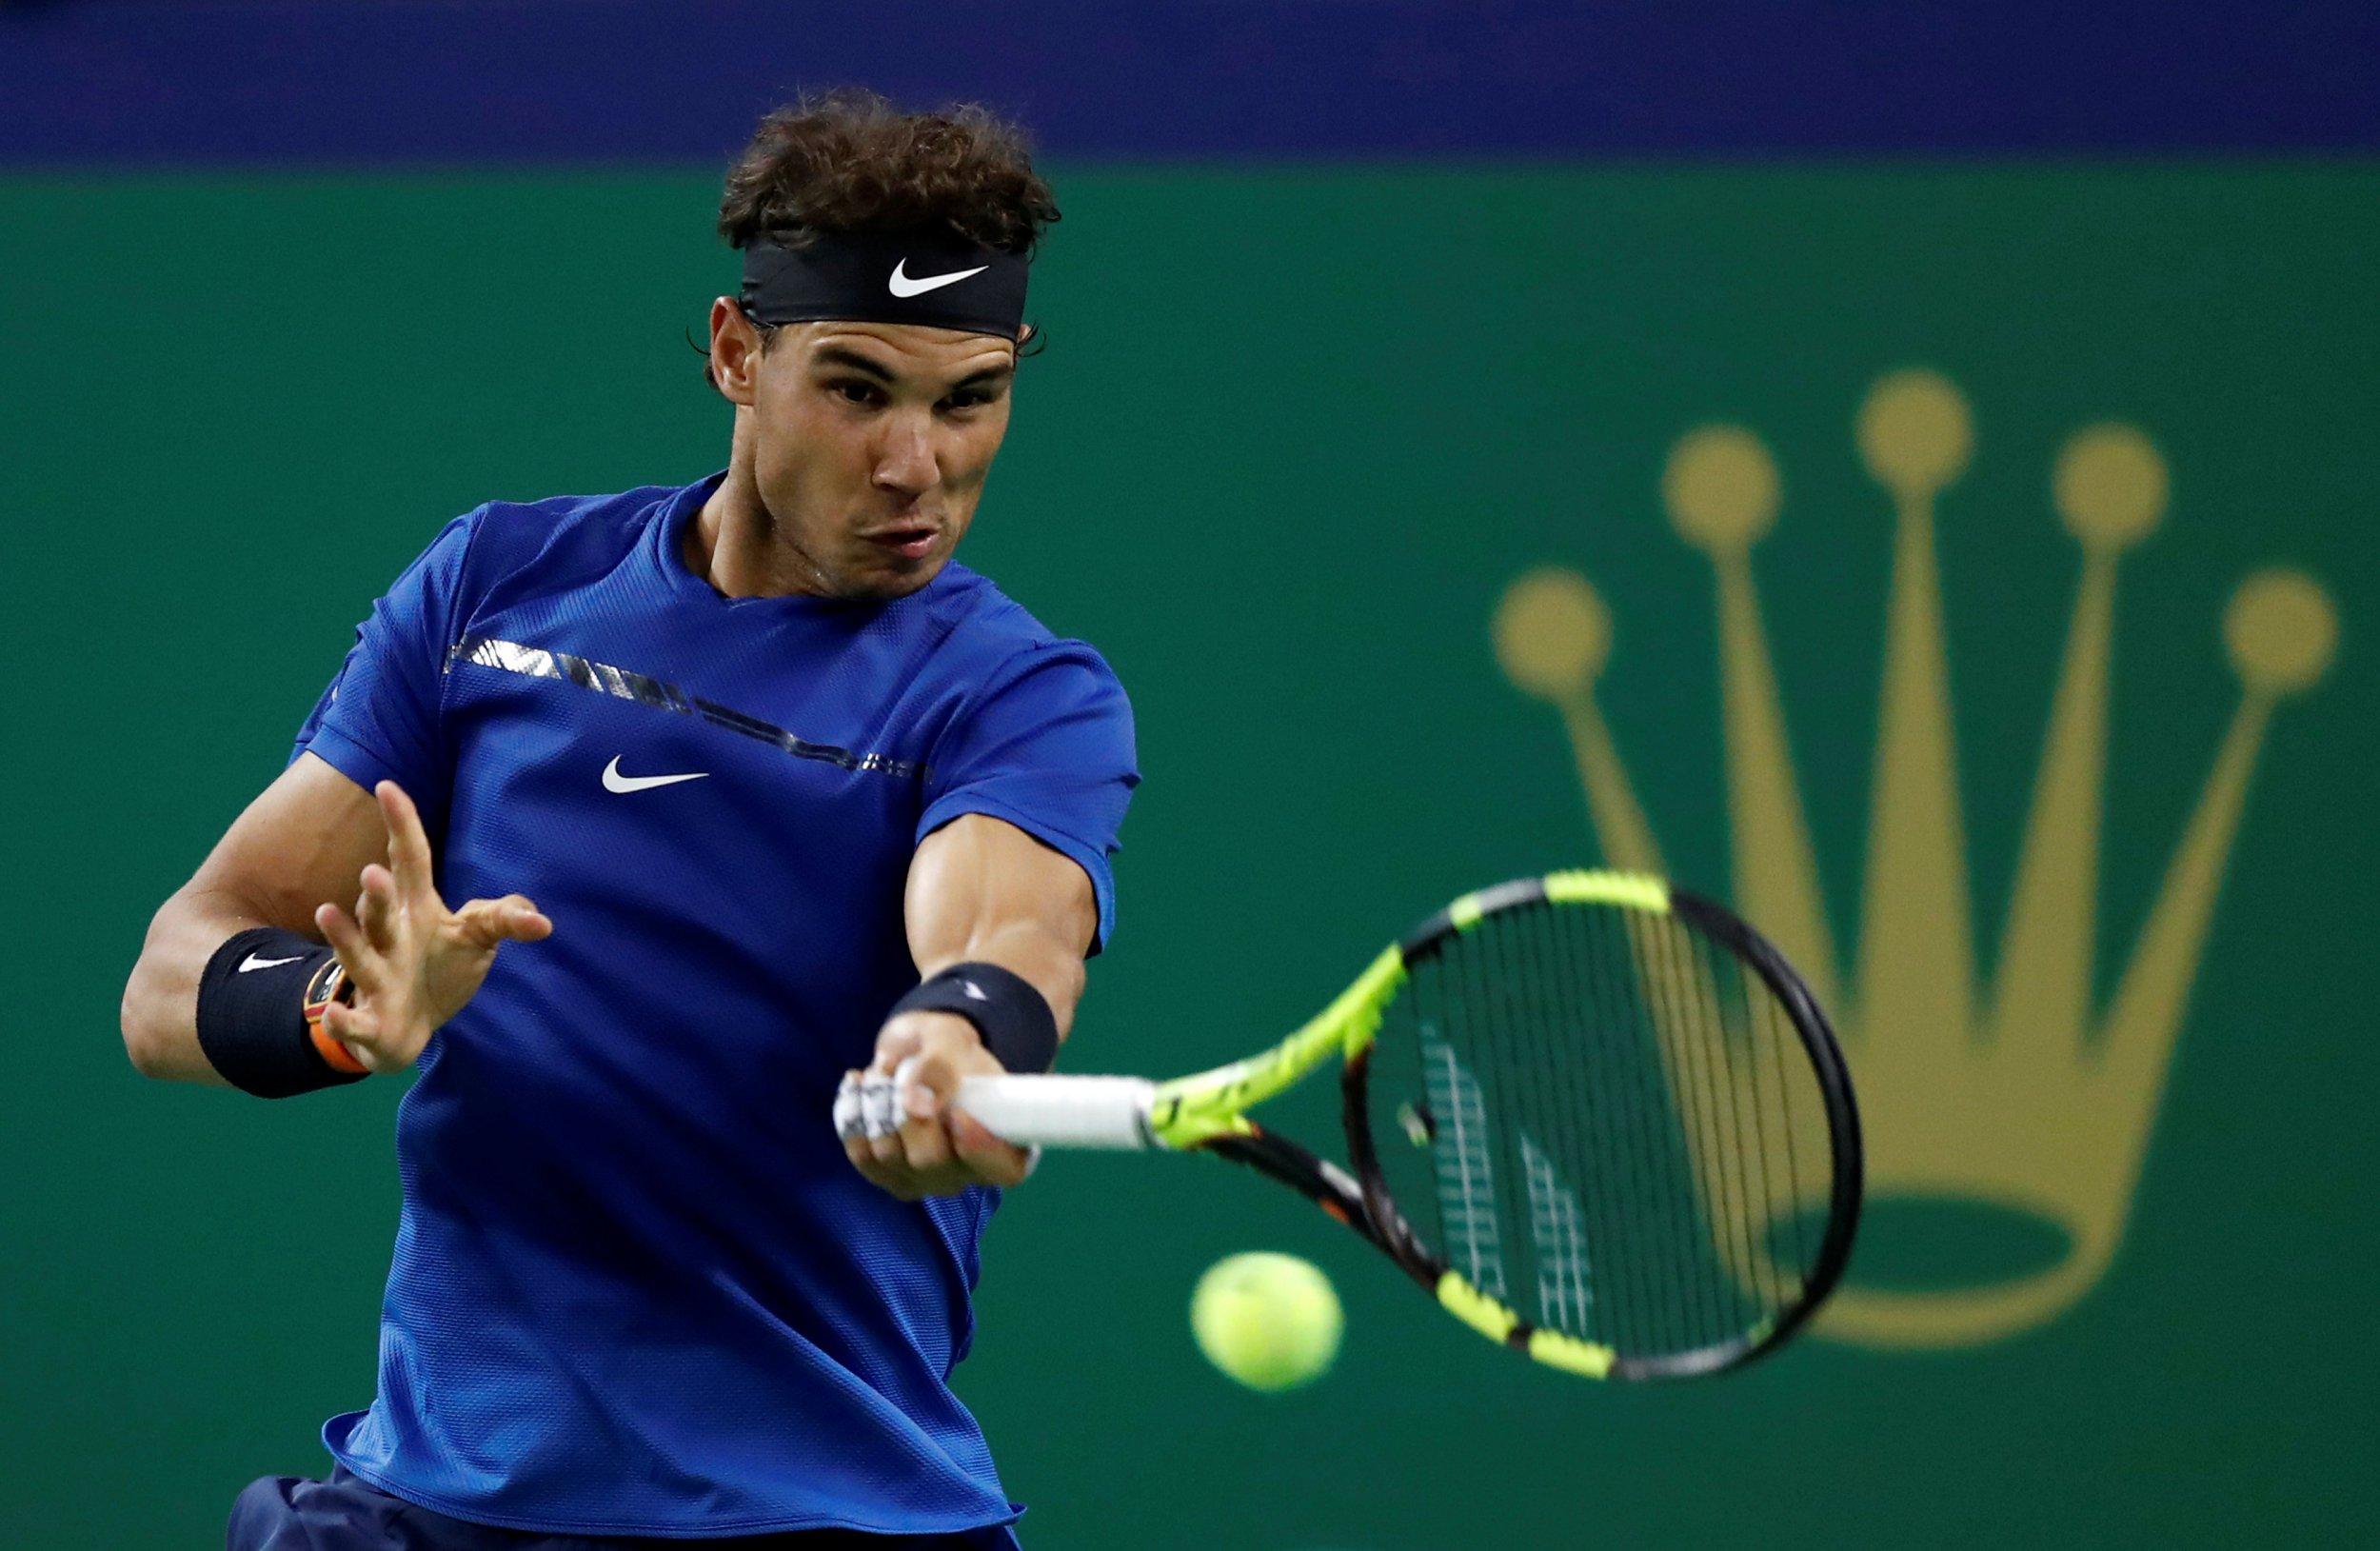 Rampant Rafael Nadal sets up Grigor Dimitrov quarter-final clash in Shanghai